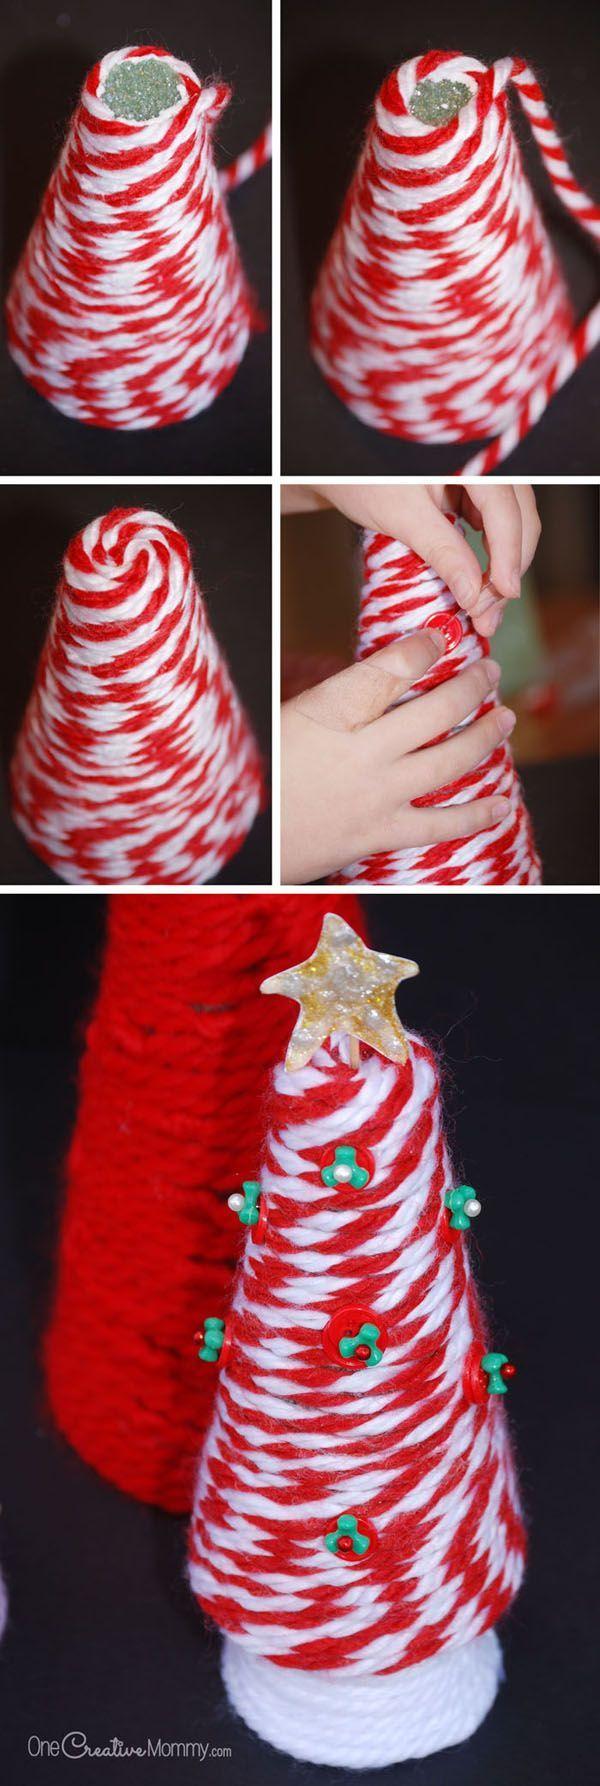 Christmas Kids Crafts Best 20 Kids Chrismas Crafts Ideas On Pinterest Kids Christmas